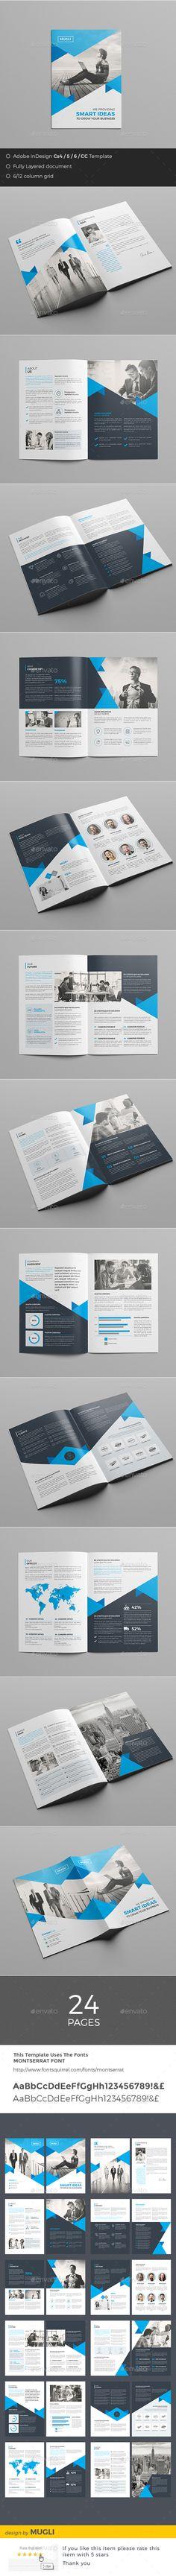 Corporate Brochure Template InDesign INDD. Download here: http://graphicriver.net/item/corporate-brochure/16182305?ref=ksioks